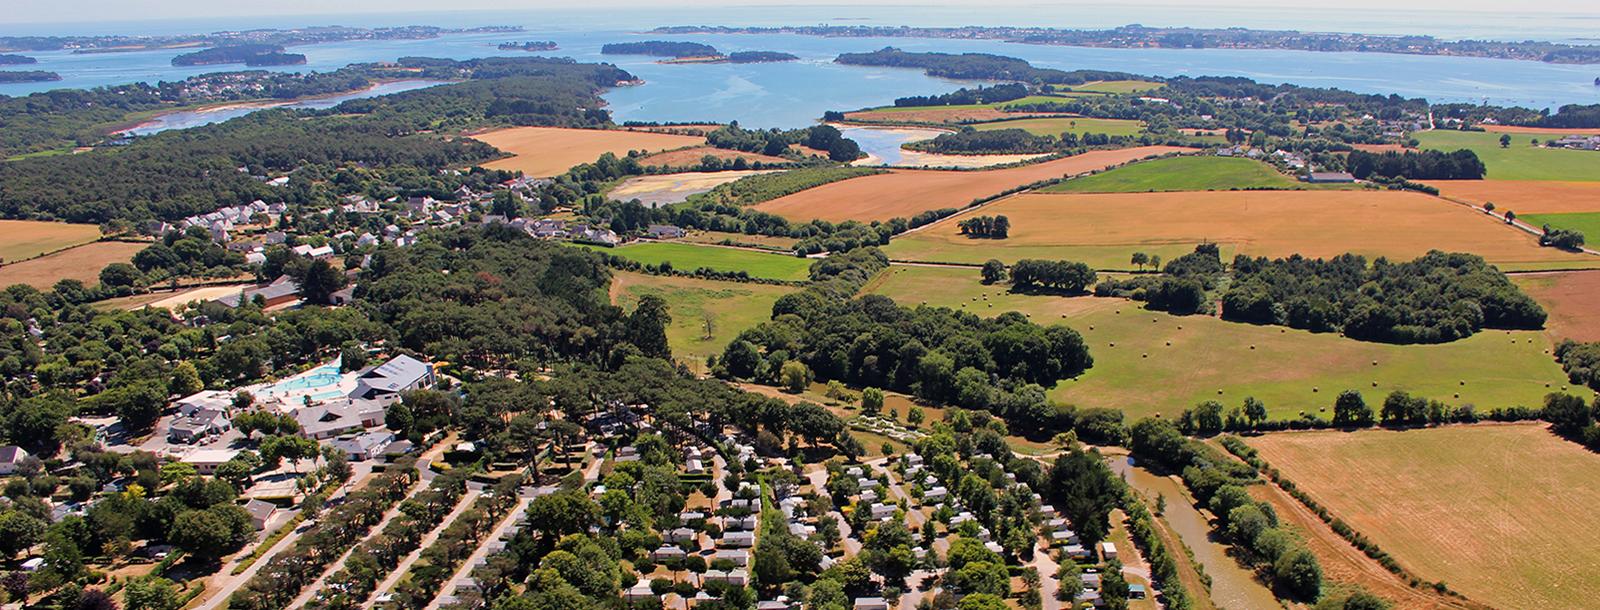 Im Golf von Morbihan, 1 km vom Meer, 3 km vom Strand